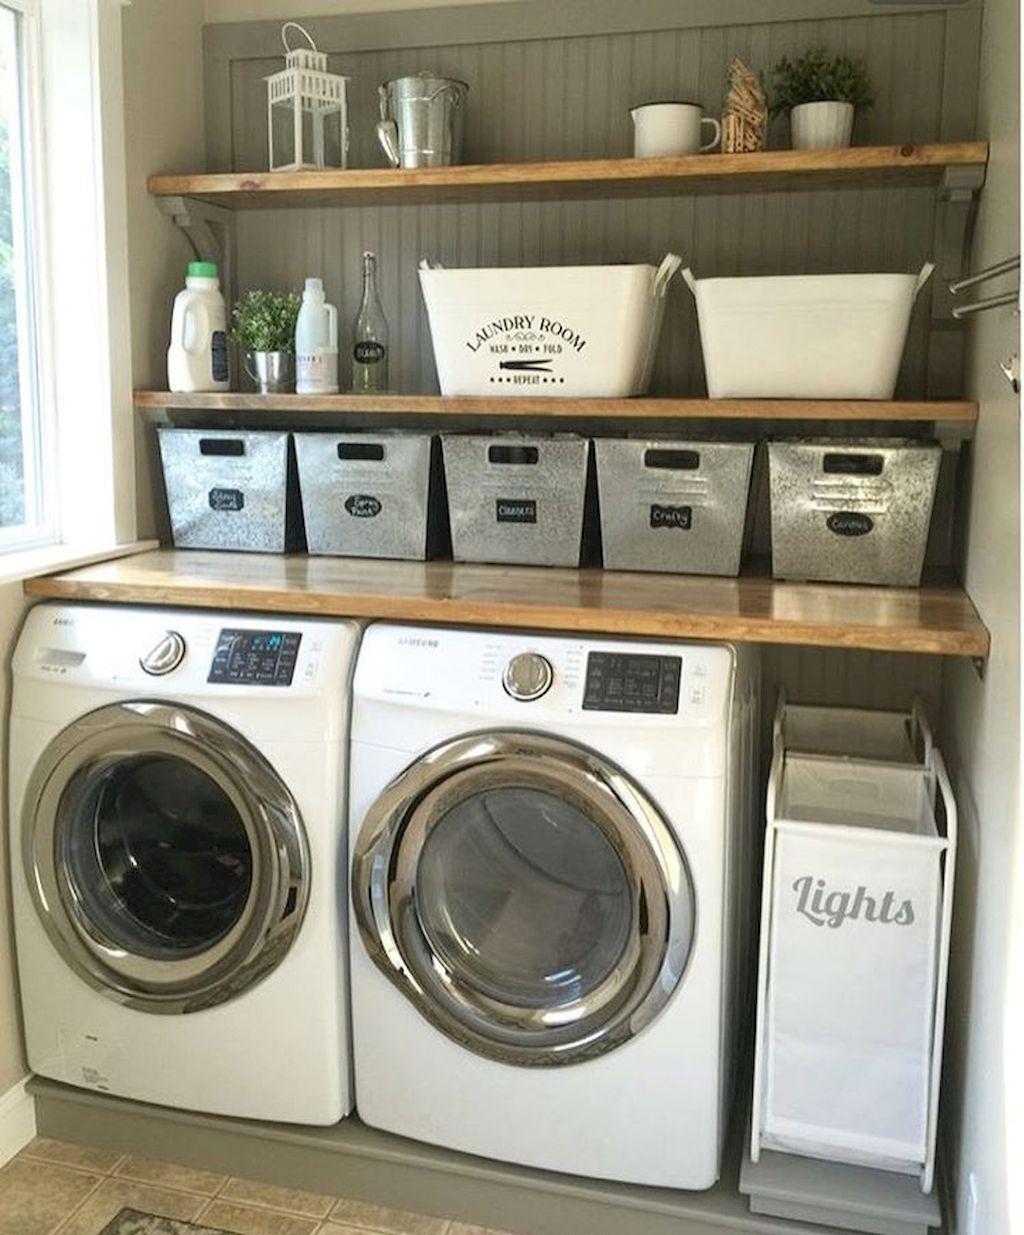 50 Farmhouse Laundry Room Storage Organization Ideas images